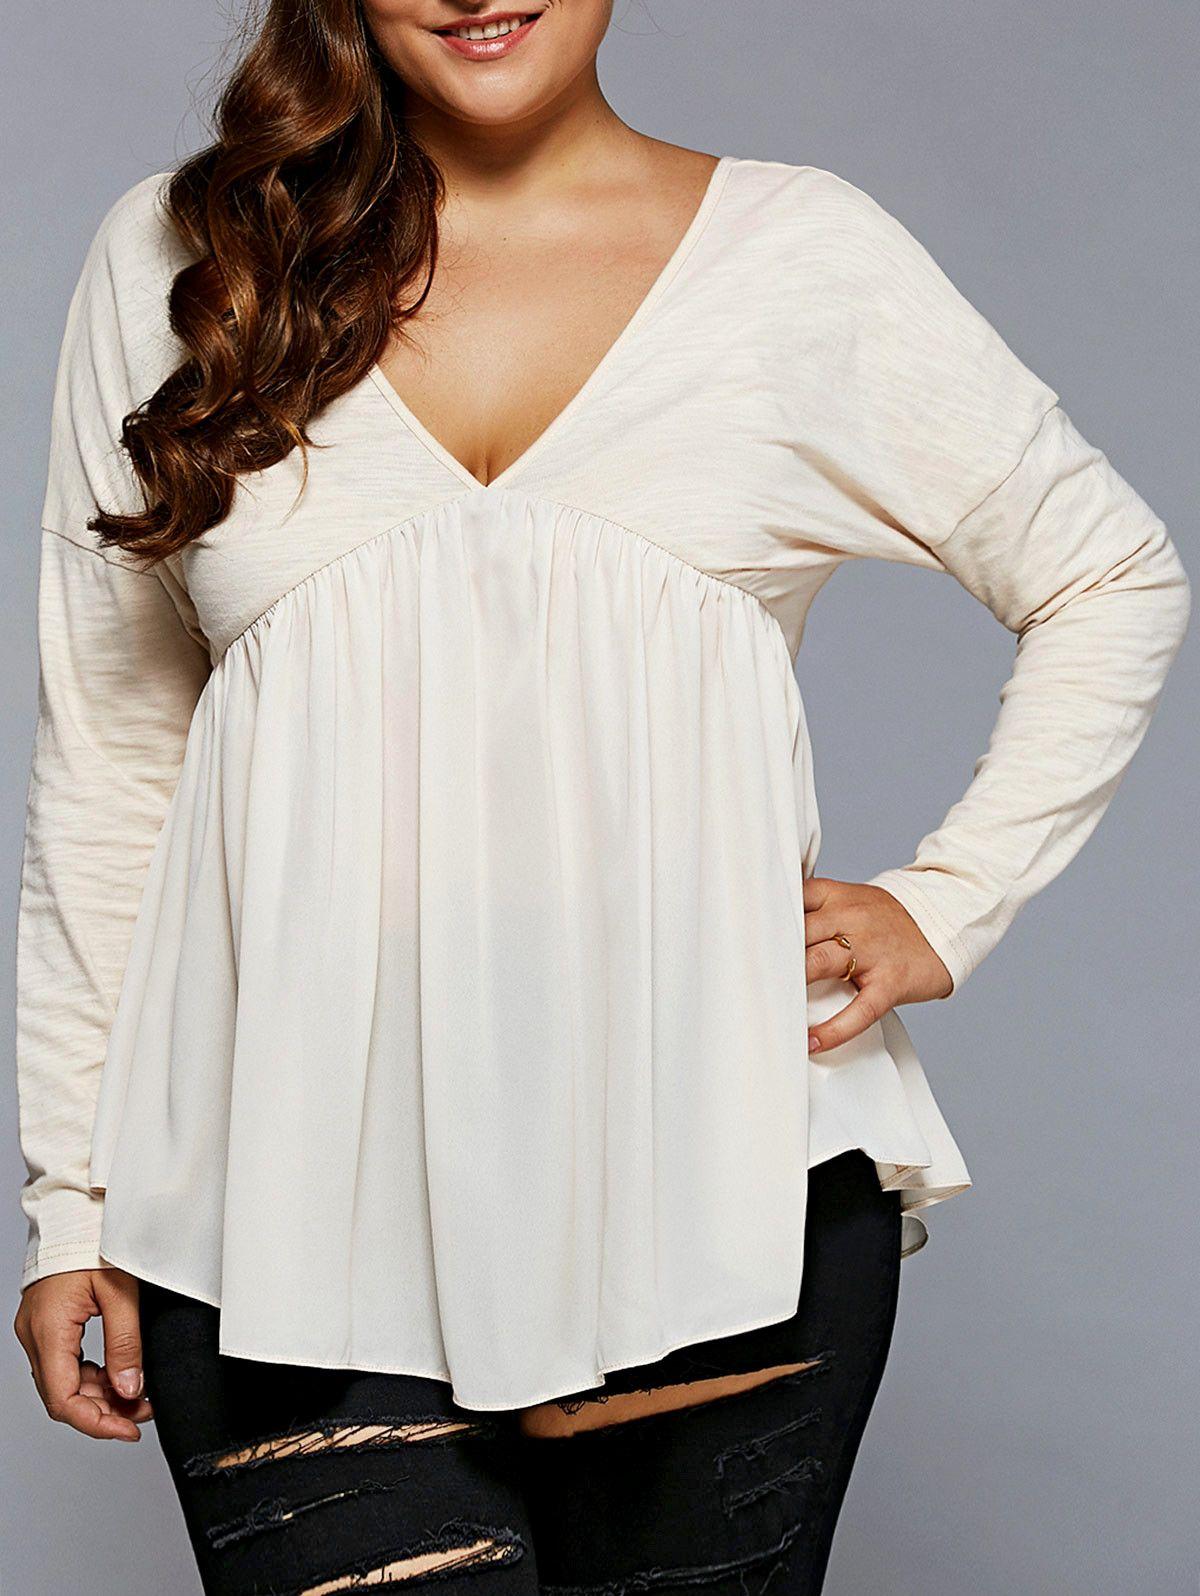 15 75 Plus Size Open Back Smock Blouse Plus Size Outfits Plus Size Blouses Fashion